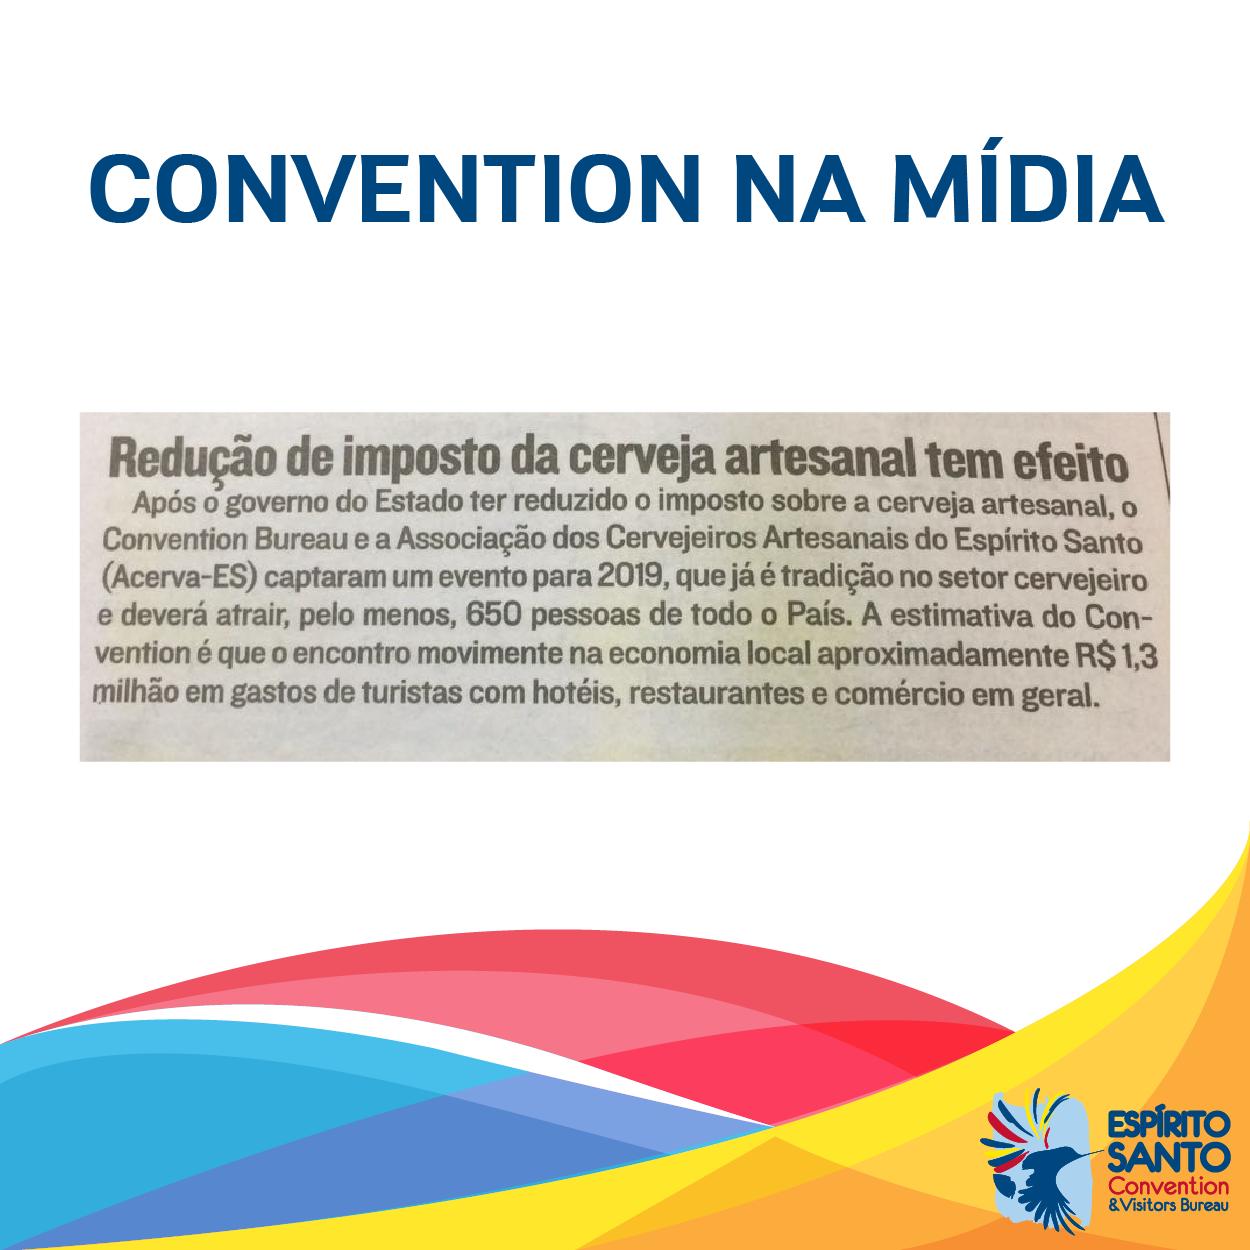 0621 - conventionnamidia-01